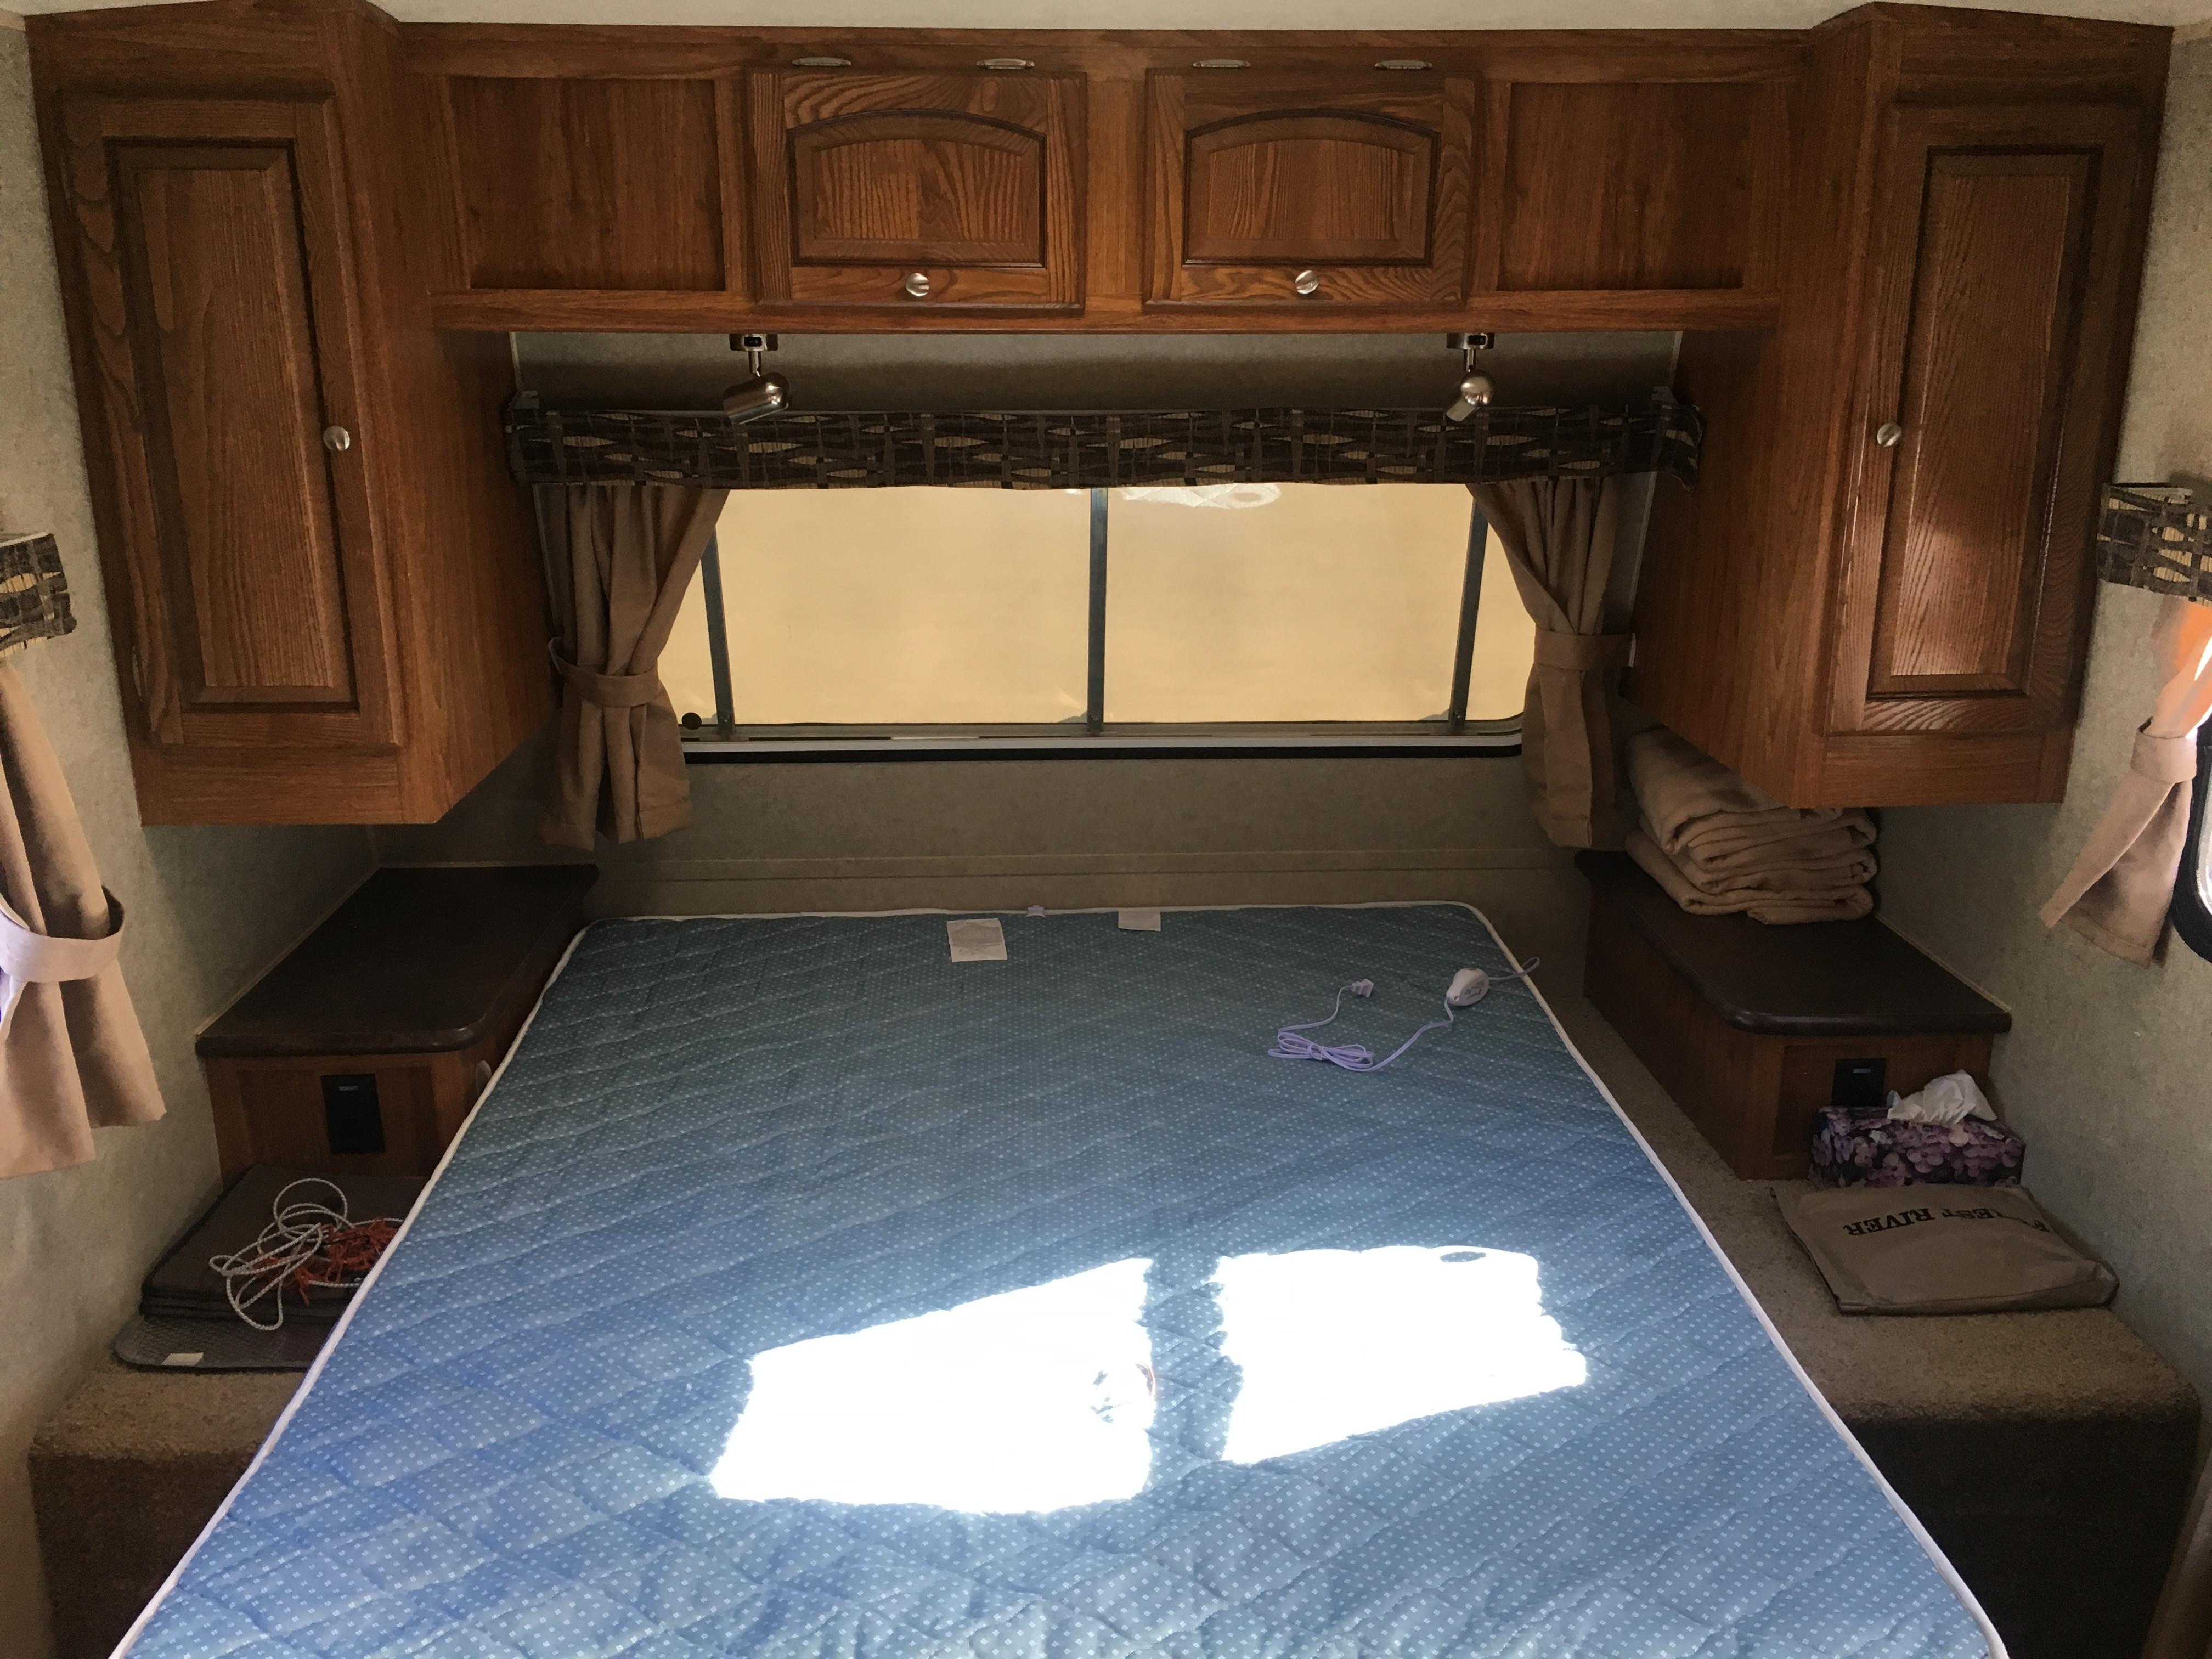 hardwood floor repair las vegas of top 25 agassiz bc rv rentals and motorhome rentals outdoorsy with regard to lqqeola9mxgniwckexxe